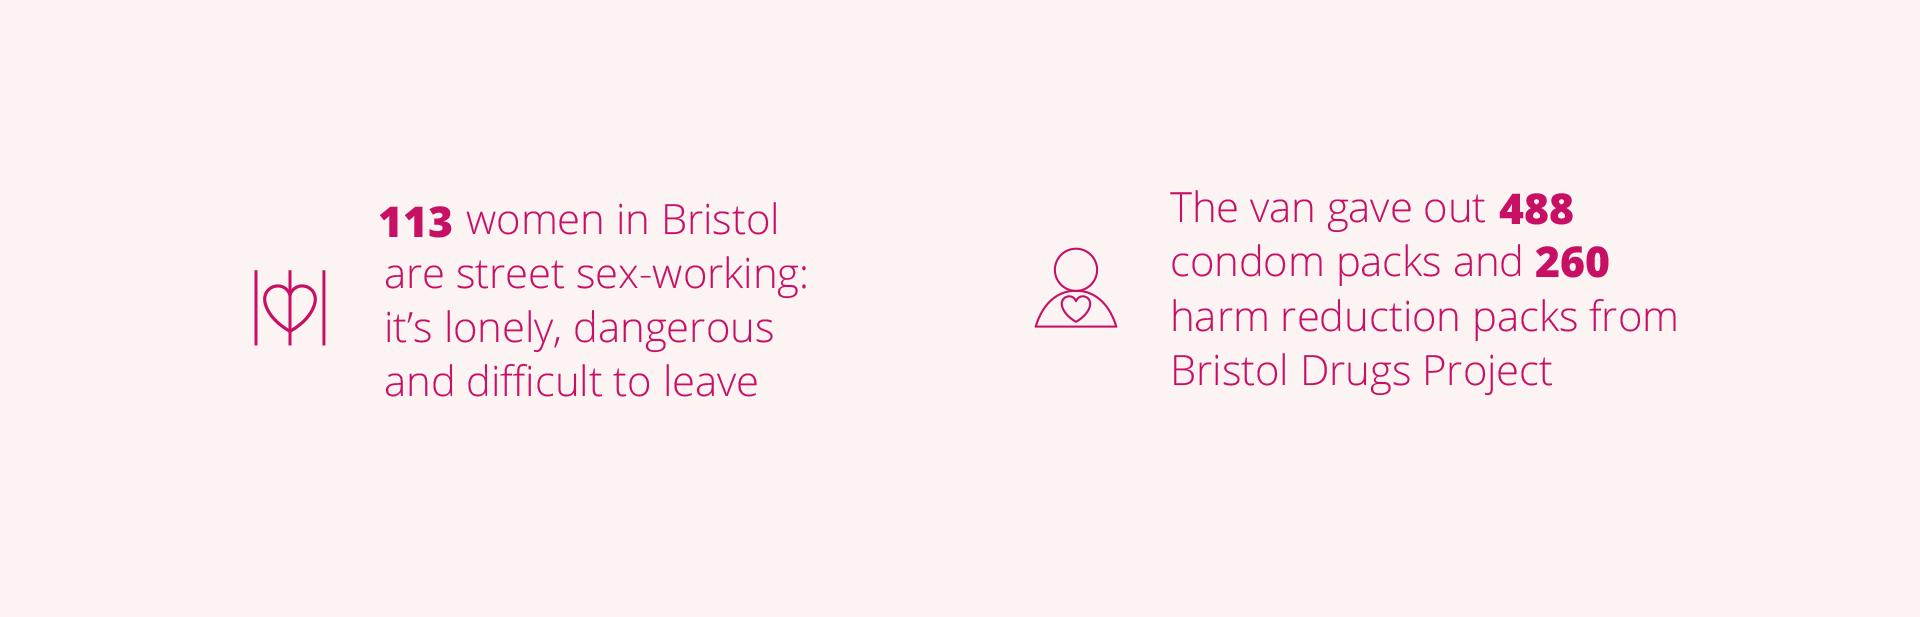 113 women in Bristol are street sex working; it